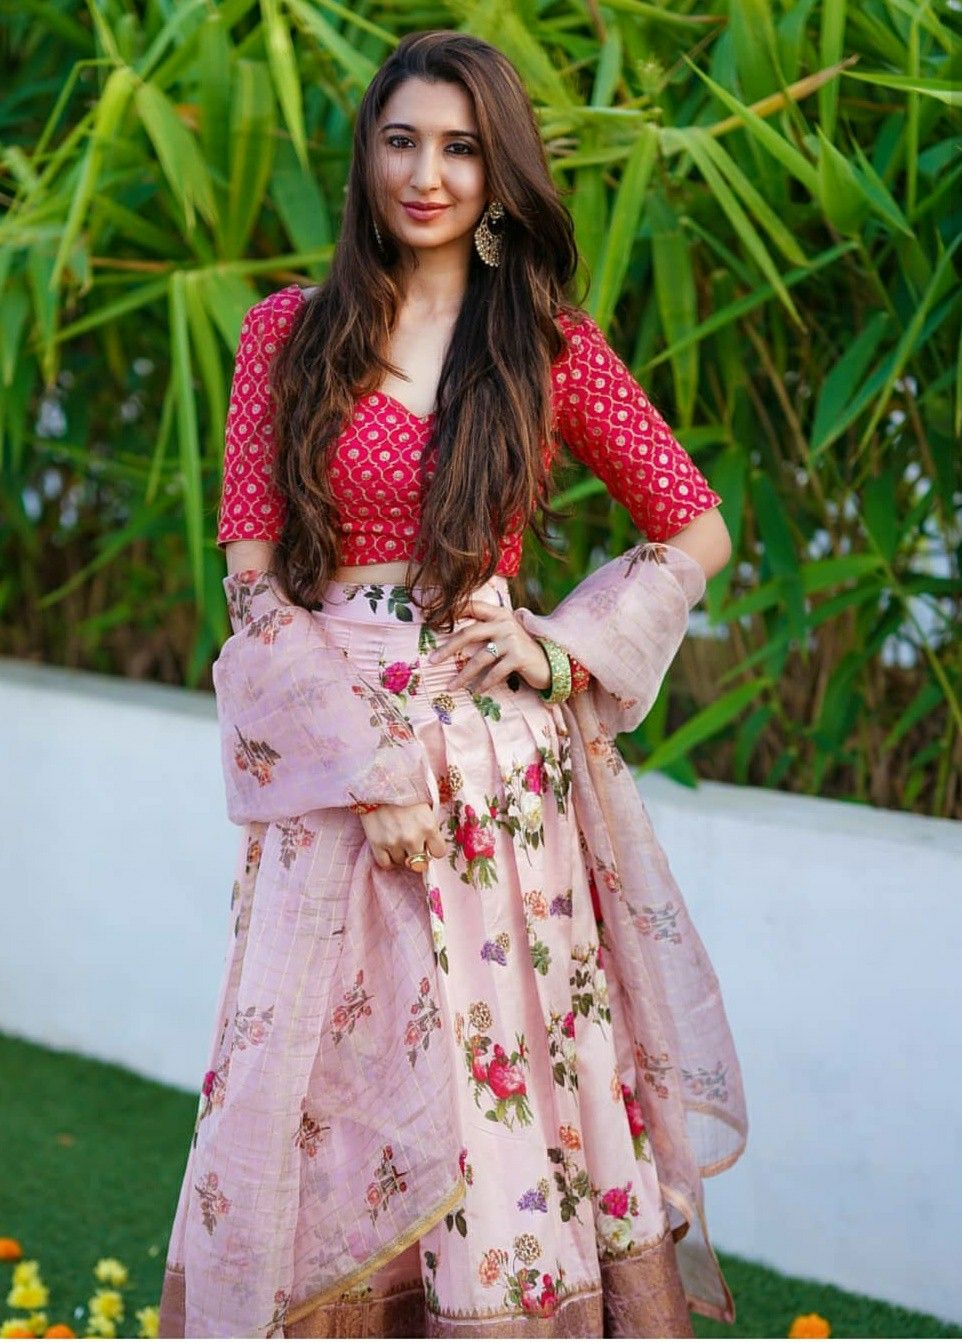 bab02a658bc8 RRs.30,164.87 Exclusive Heavy Designer Beautiful Bridal Red Color Bridal  Lehenga Choli - Stylizone #bridalportrait #TheFabApp #FabOccasions  #indianbride ...